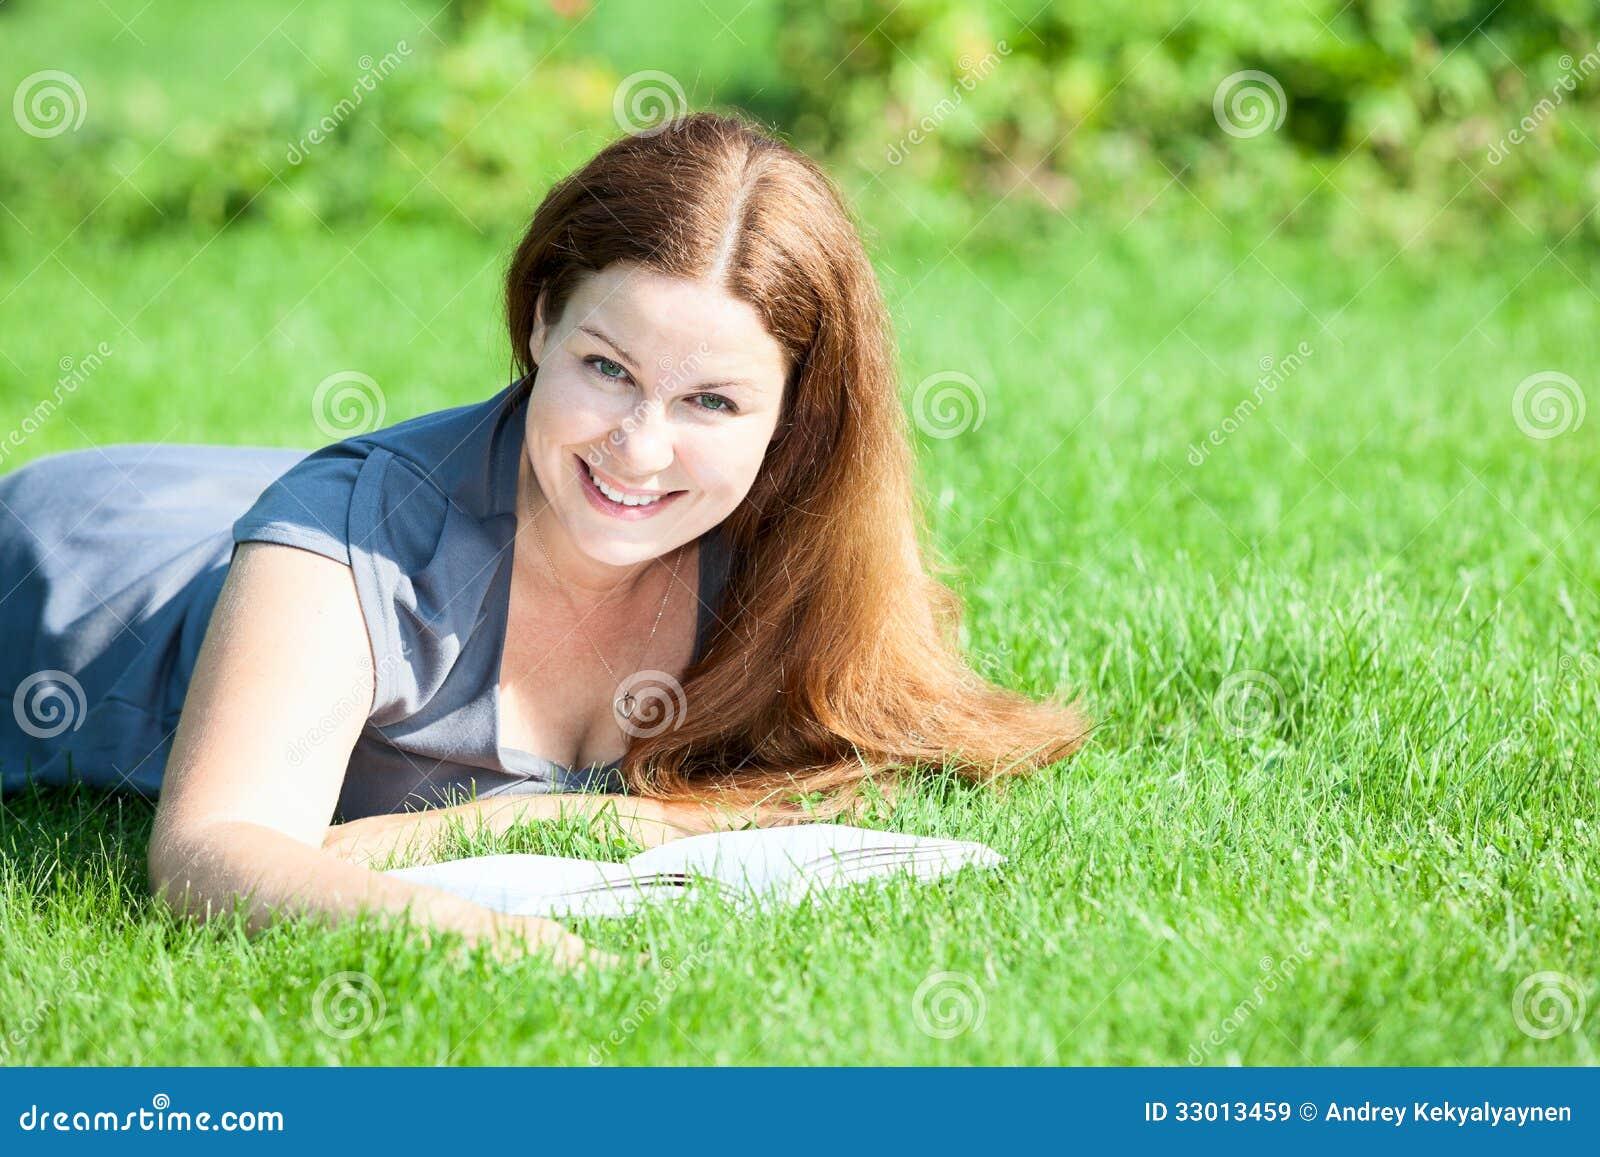 Симпатичная молодая девушка фото 9 фотография